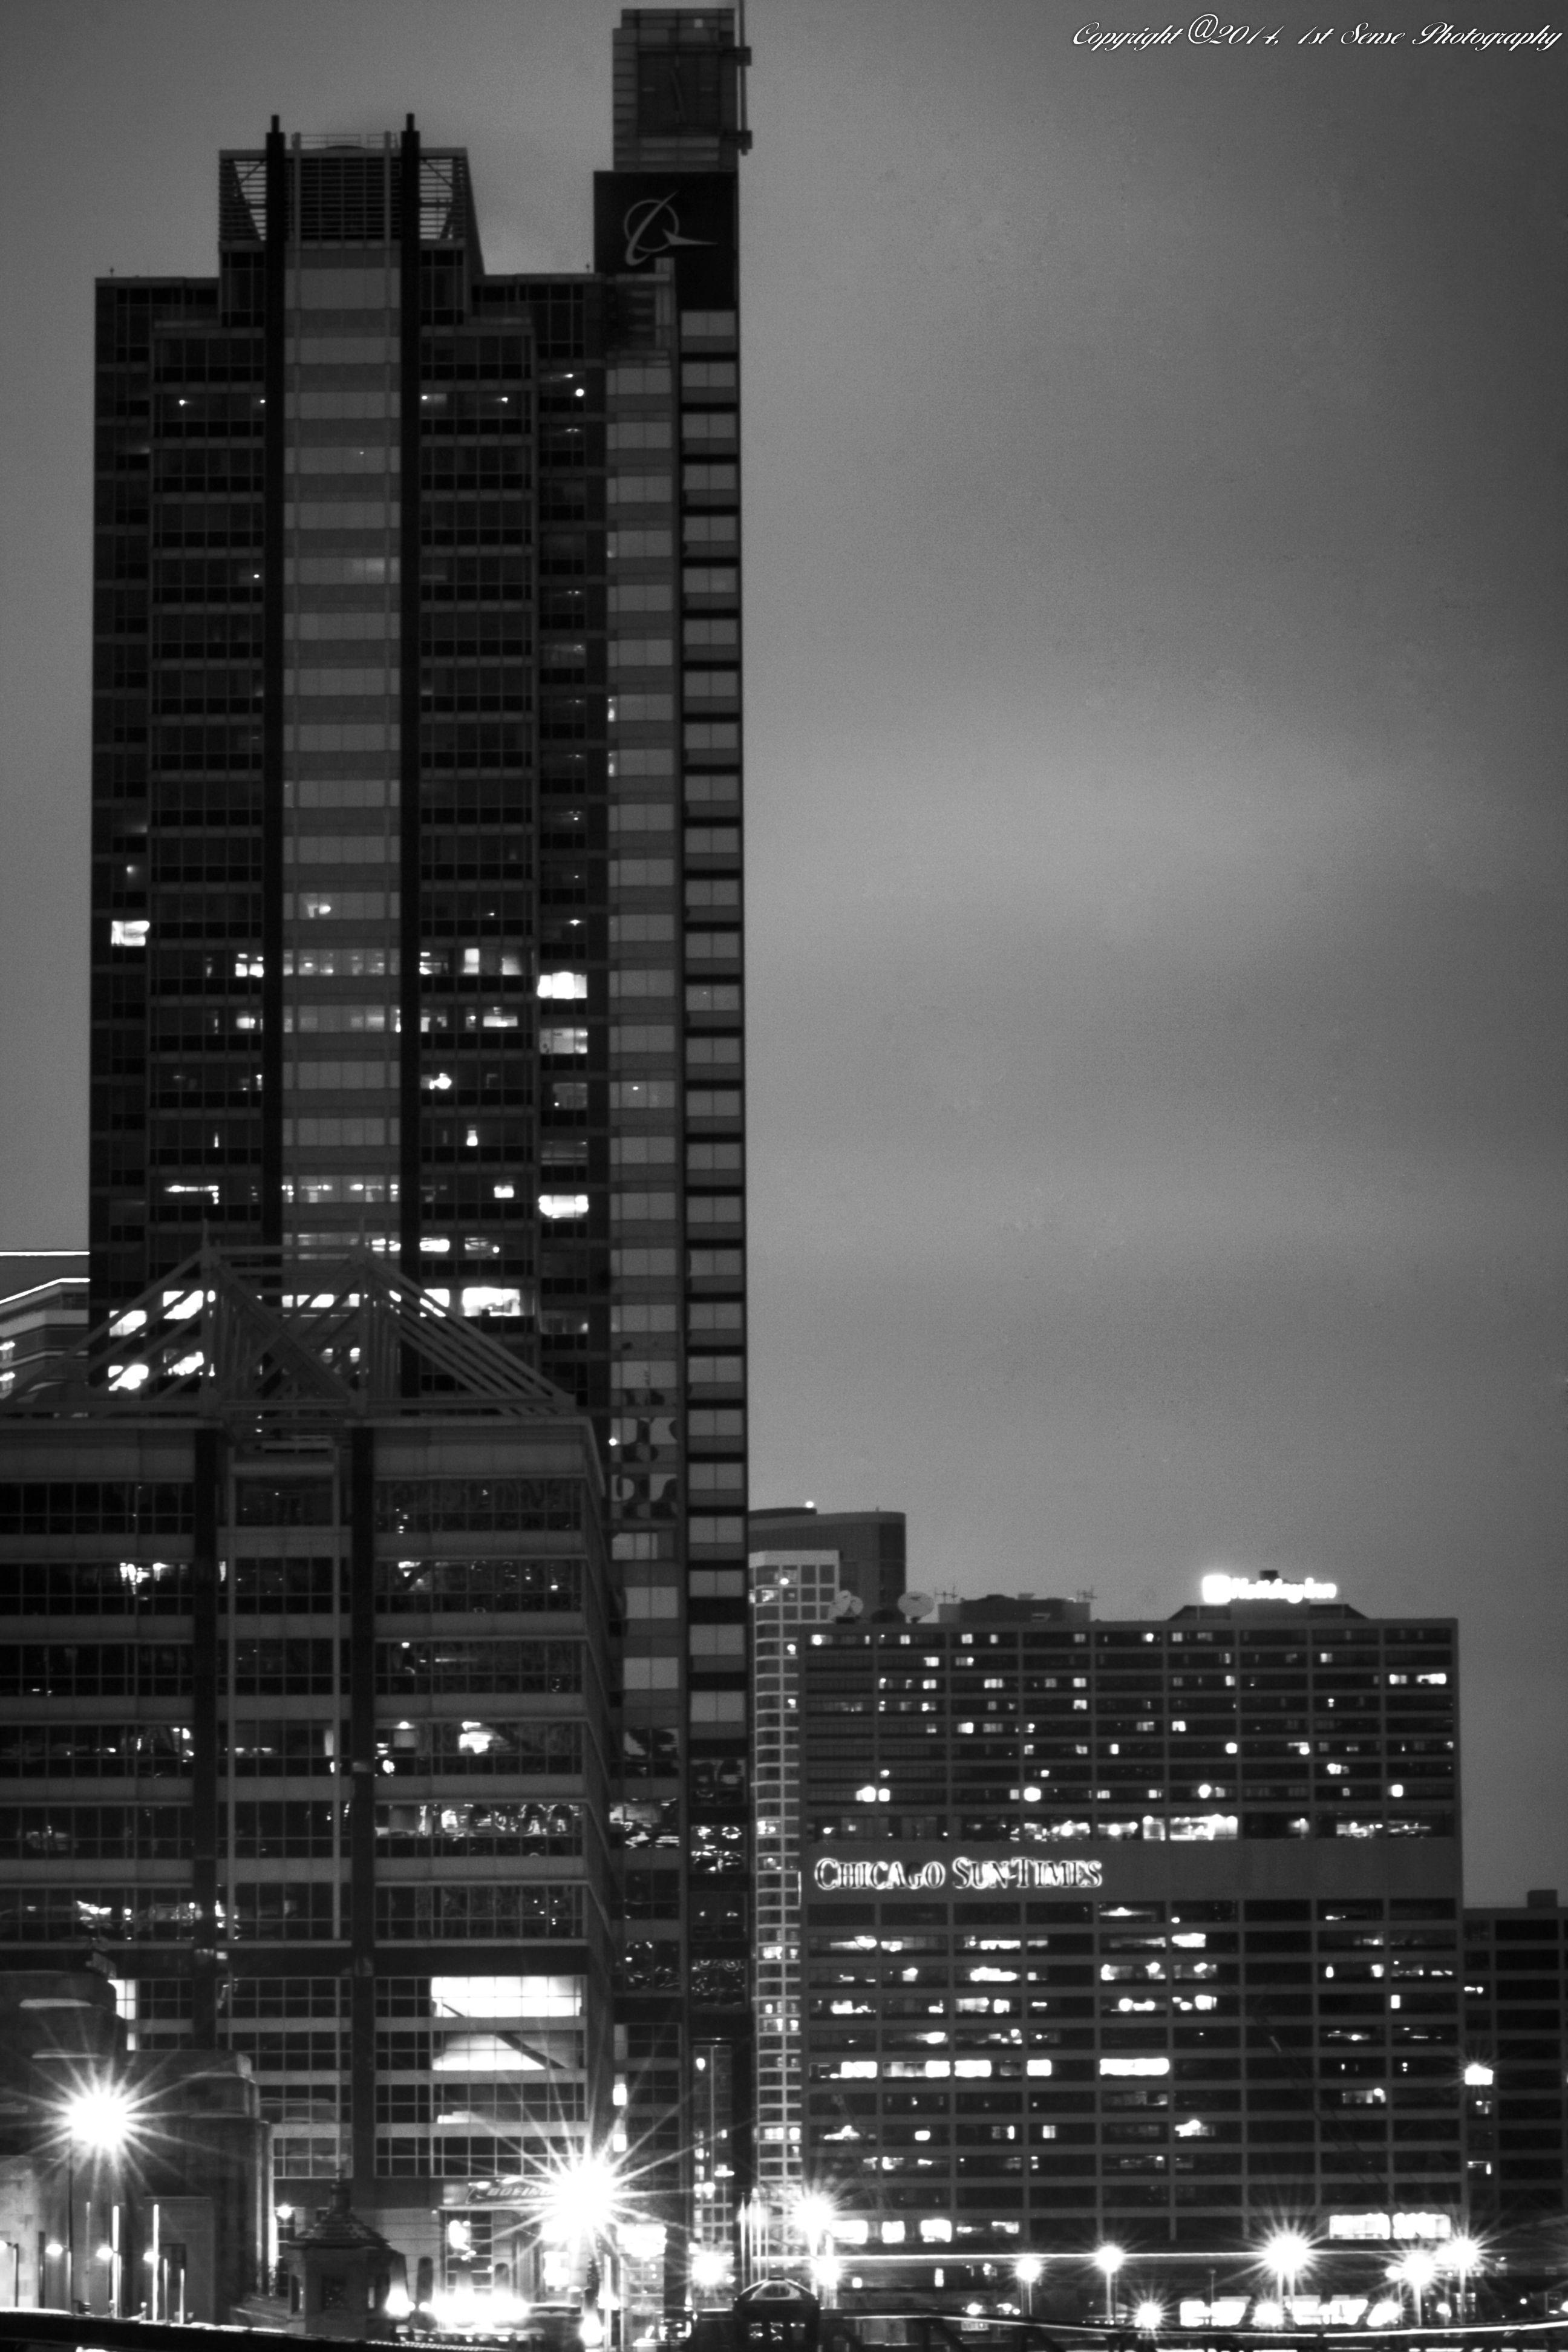 Chicago, Illinois Winter night, Chicago, Union station